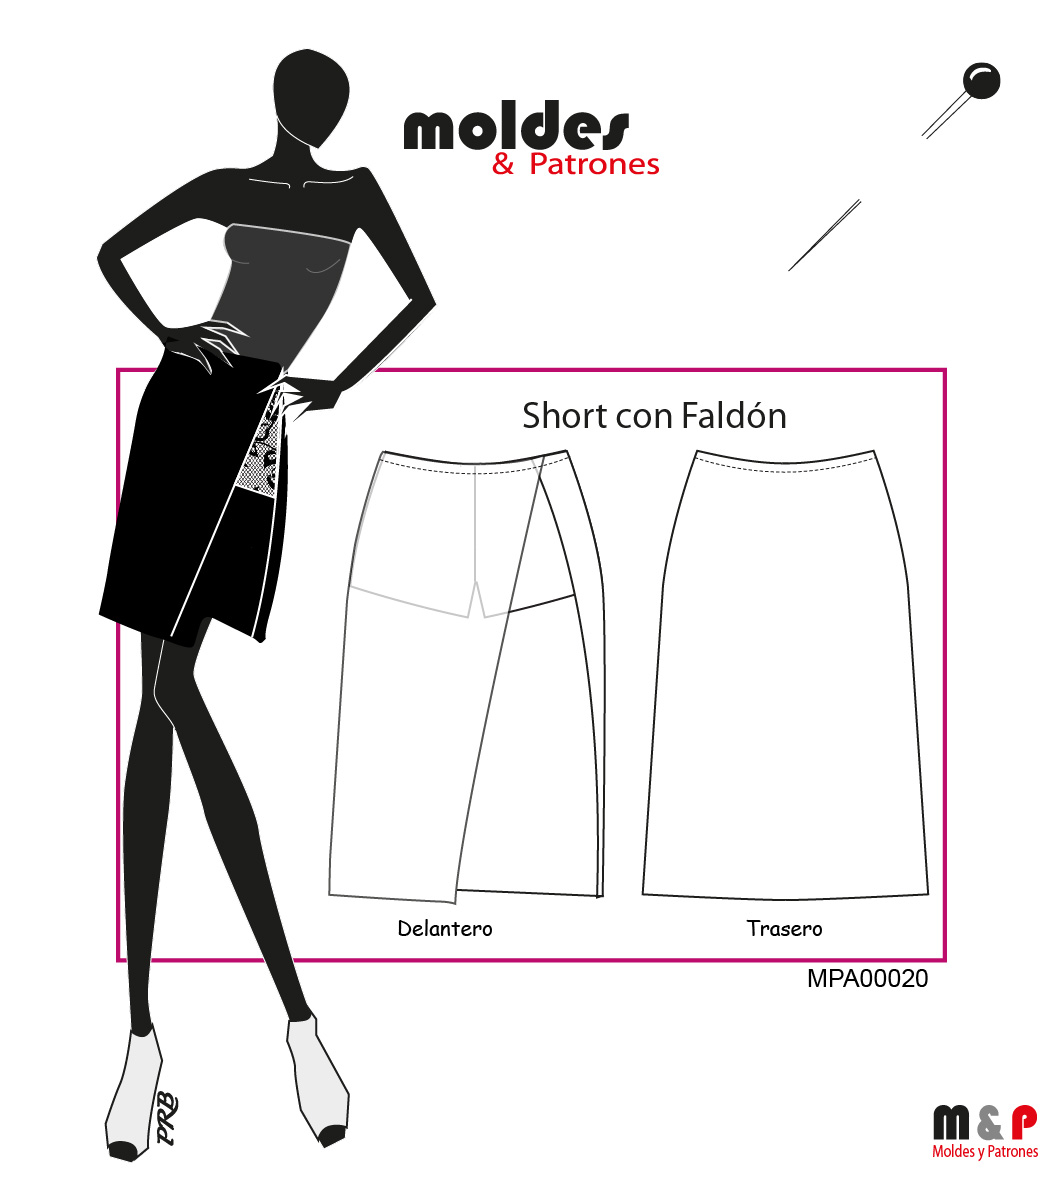 3 TALLAS S M L - Short con Faldón